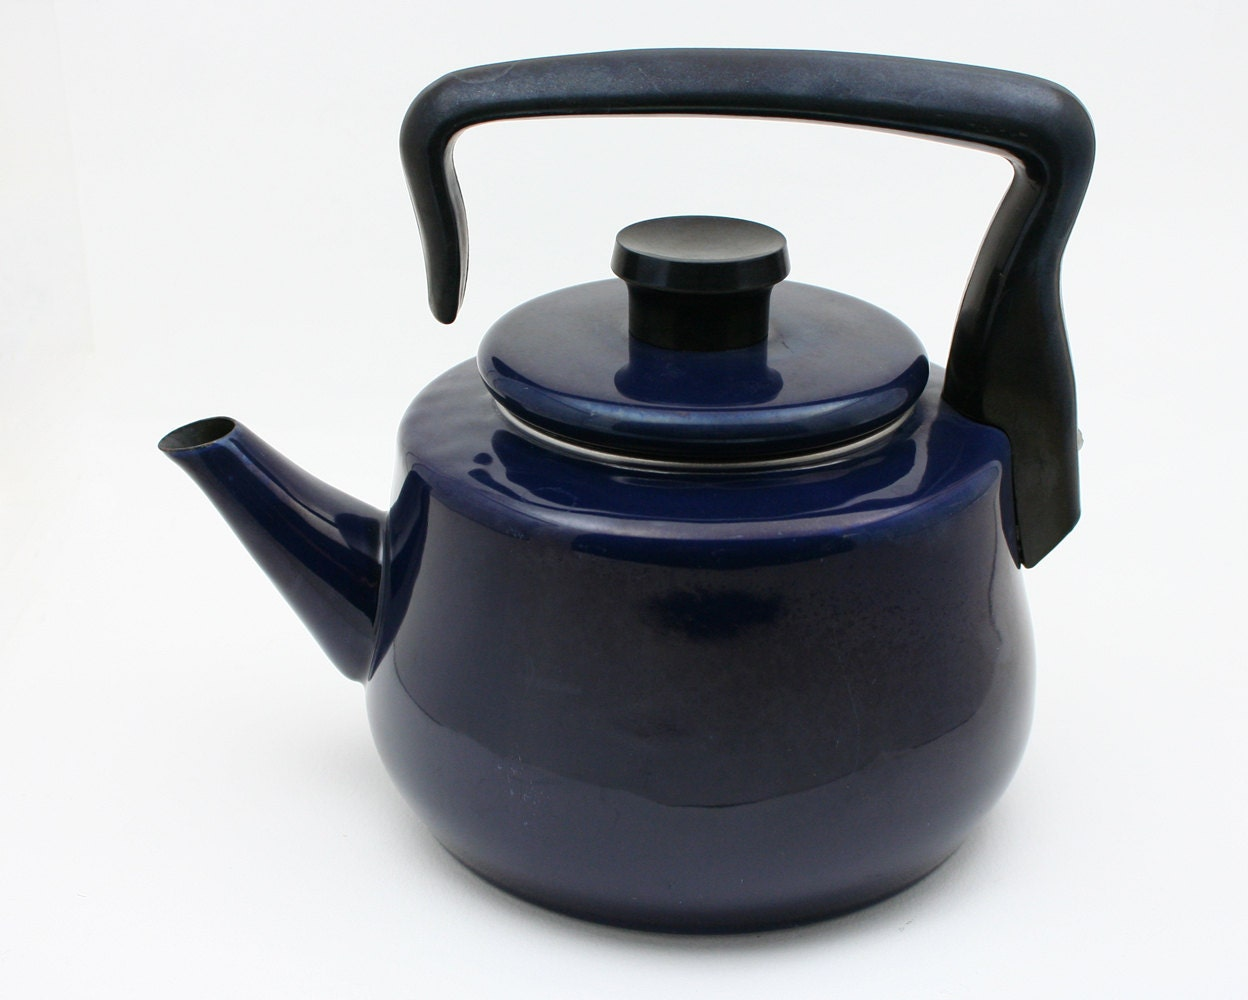 Tea kettle midnight blue enamelware teapot by SmilingCatVintage #232630